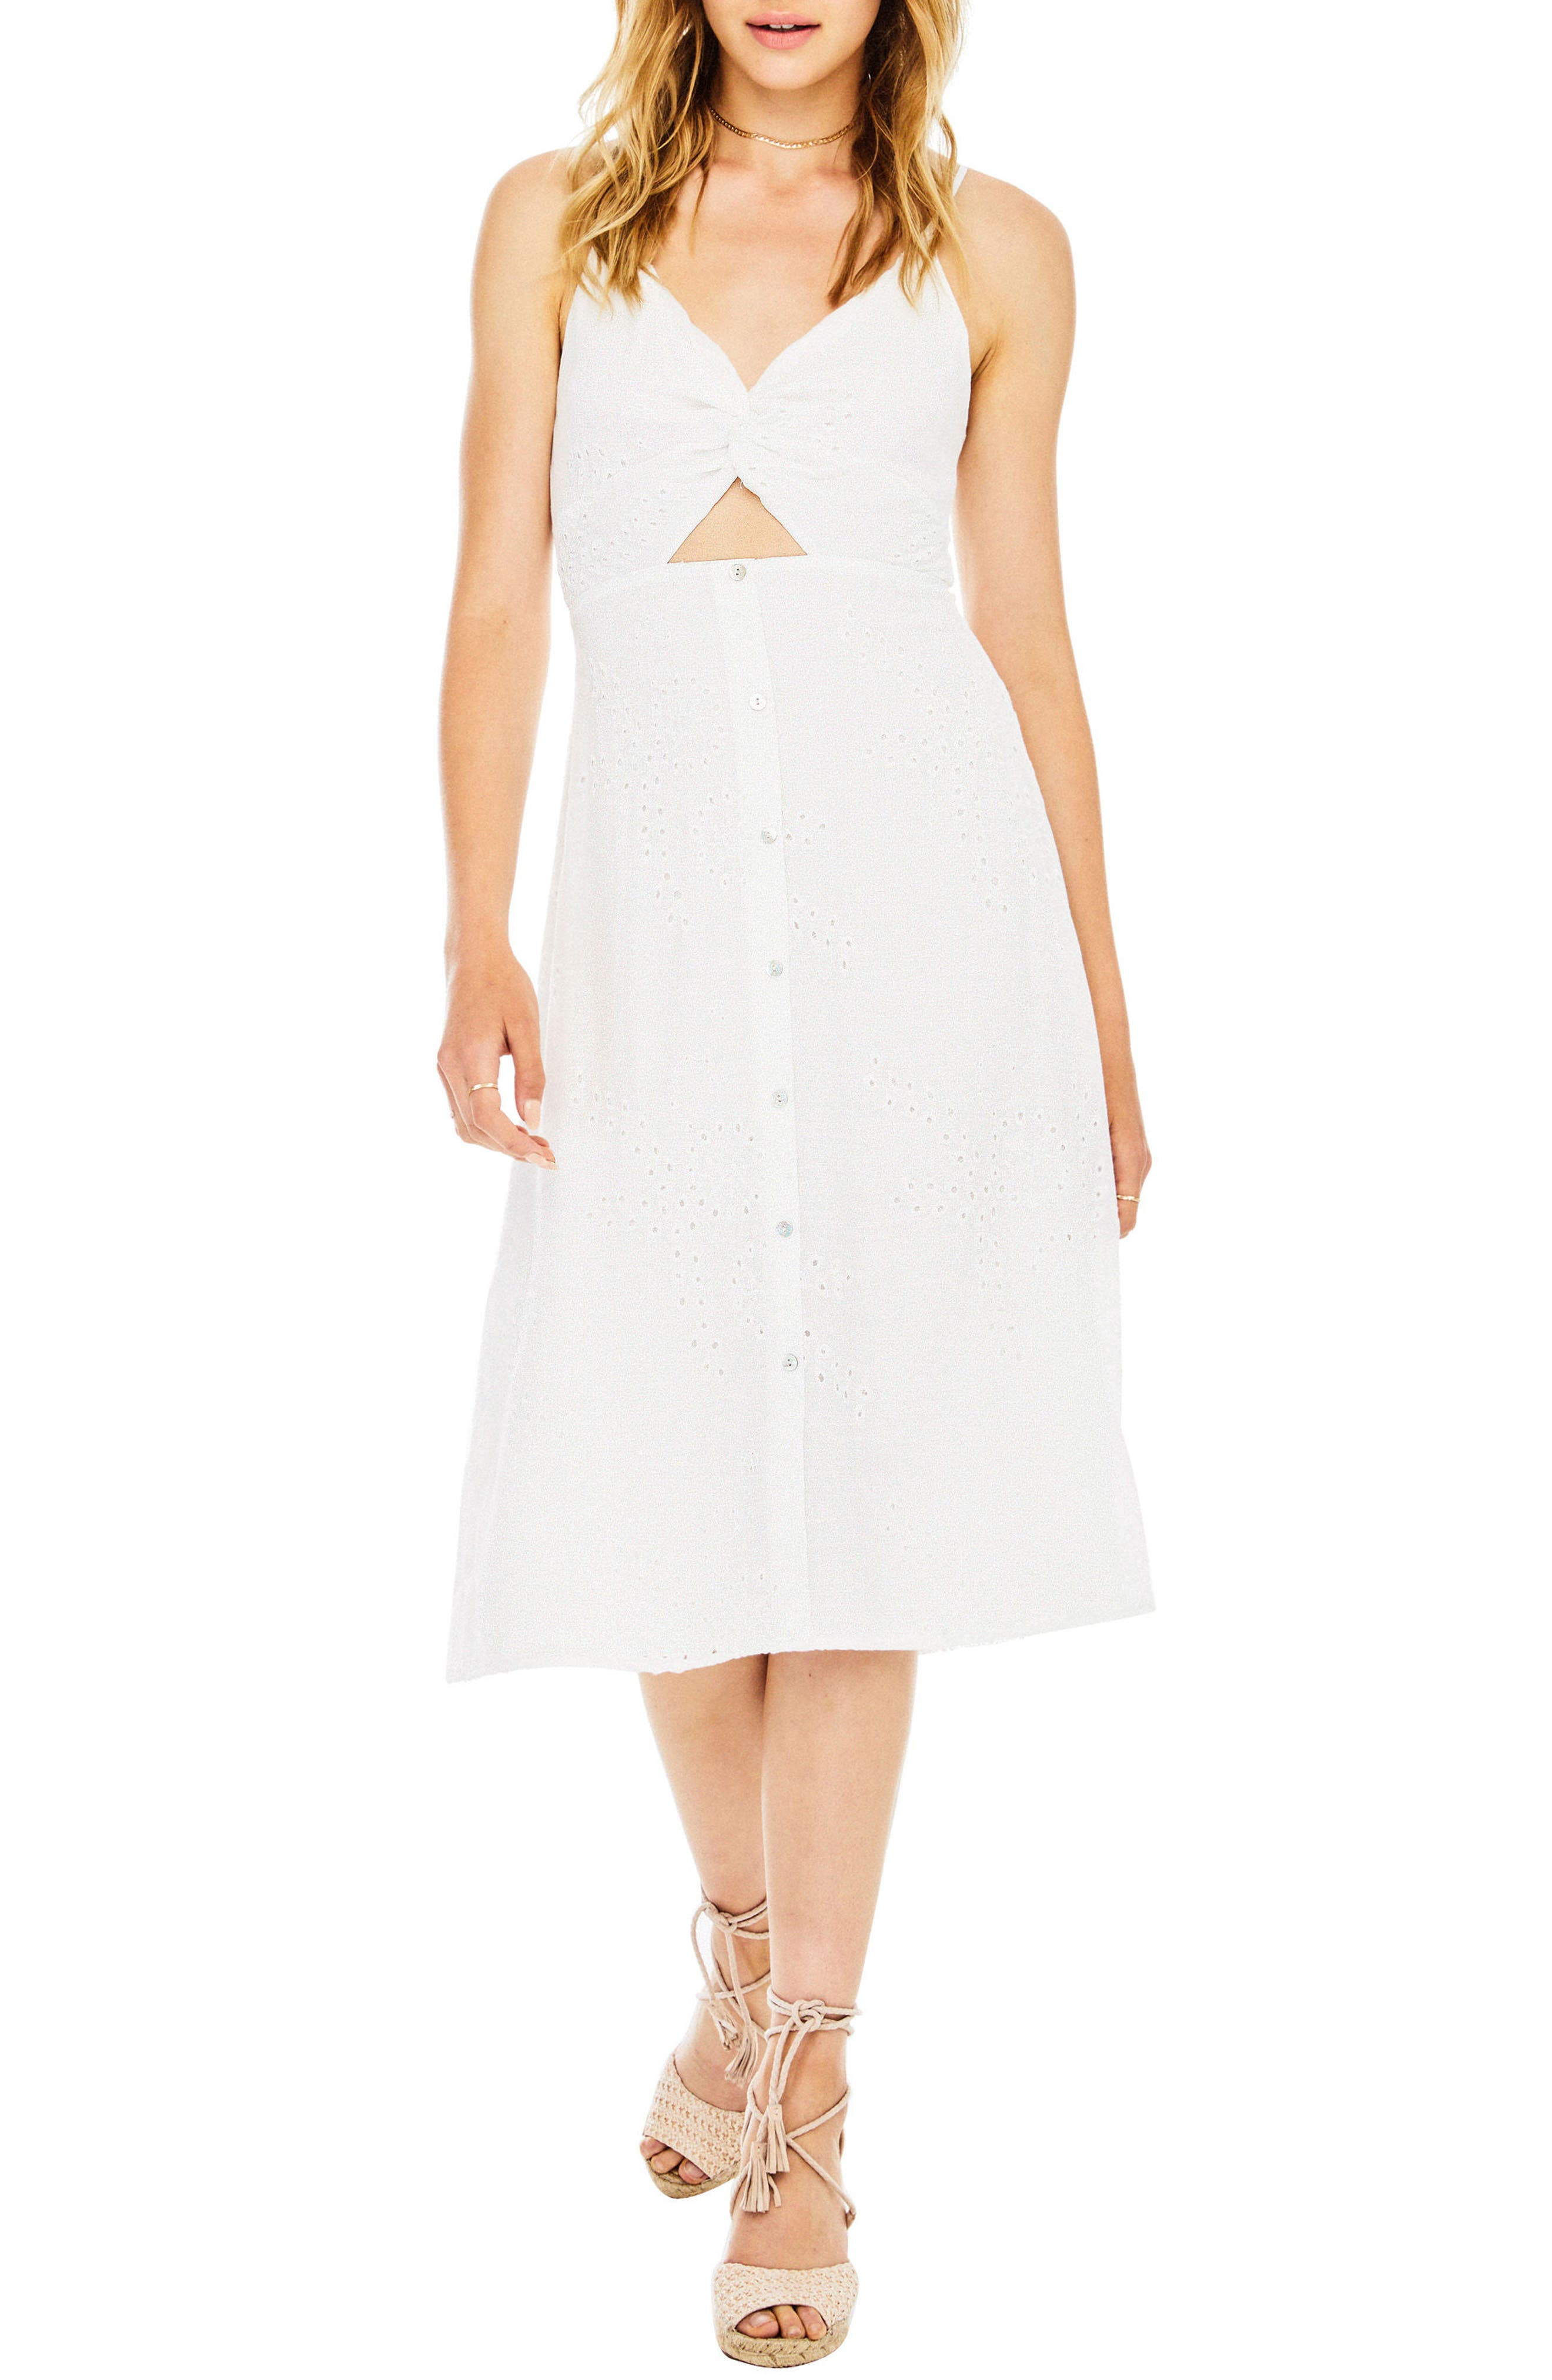 Alternate Image 1 Selected - ASTR the Label Ellowyn Dress